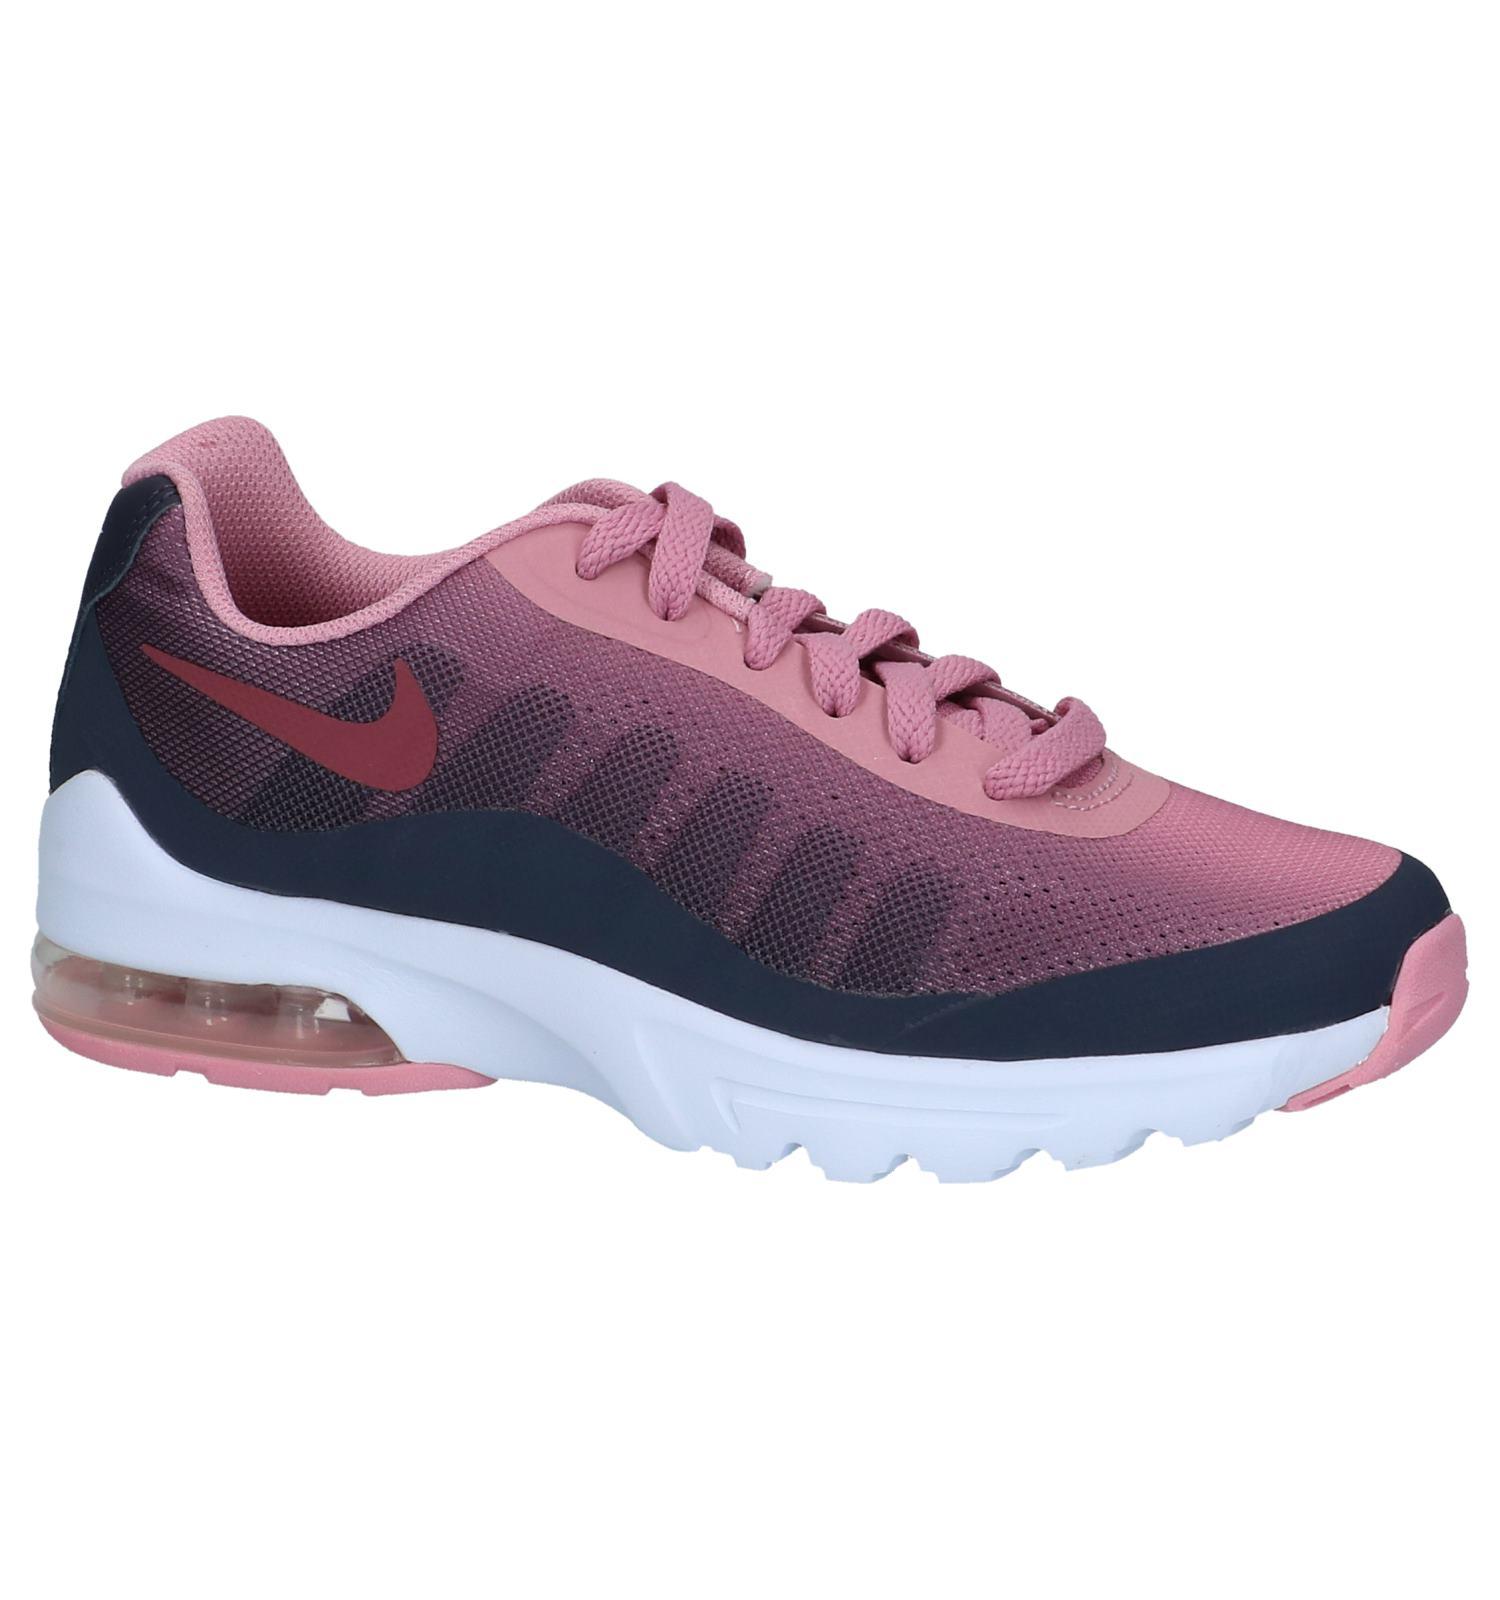 fc412e799f4 Paars/Roze Nike Air Max Invigor Sneakers | TORFS.BE | Gratis verzend en  retour